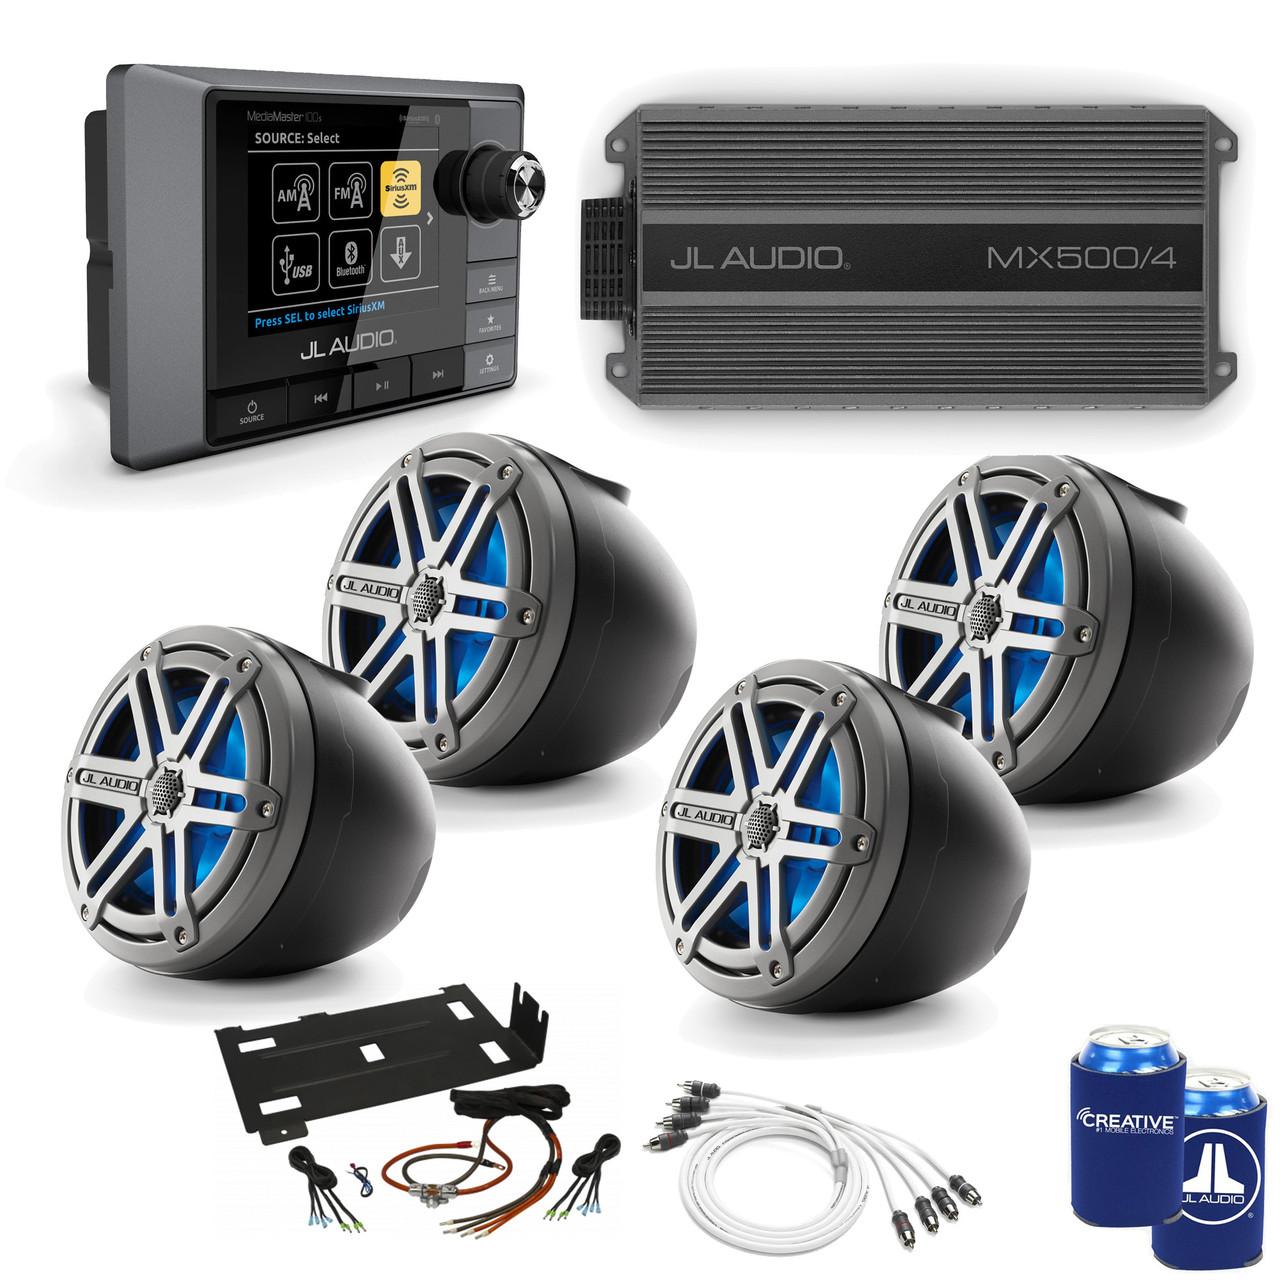 JL Audio RZR Bundle - MM100S MediaMaster, MX500/4 Amplifier, 4 anium on fi audio wiring, audiobahn wiring, fender wiring, pioneer wiring, ma audio wiring, bosch wiring,